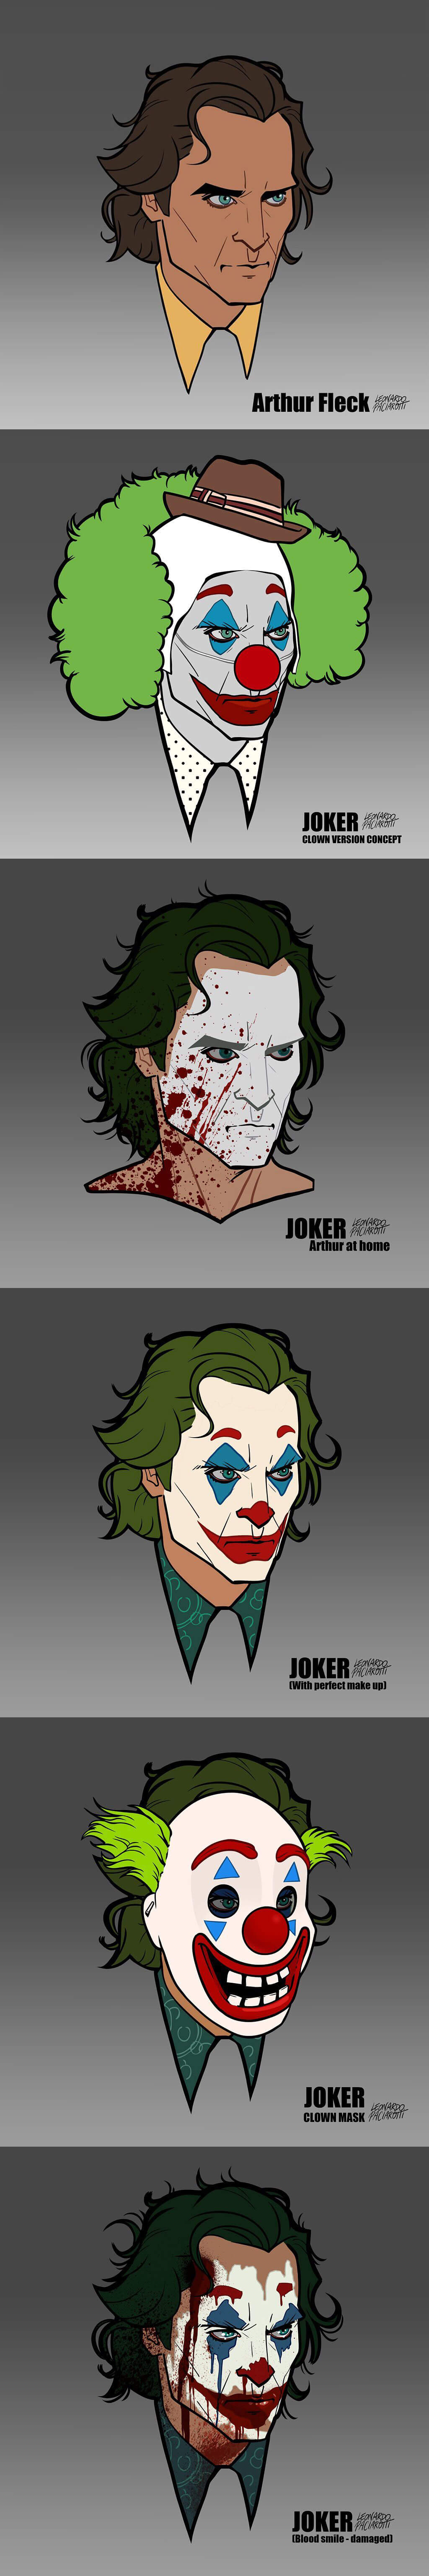 Joker Art by Leonardo Paciarotti